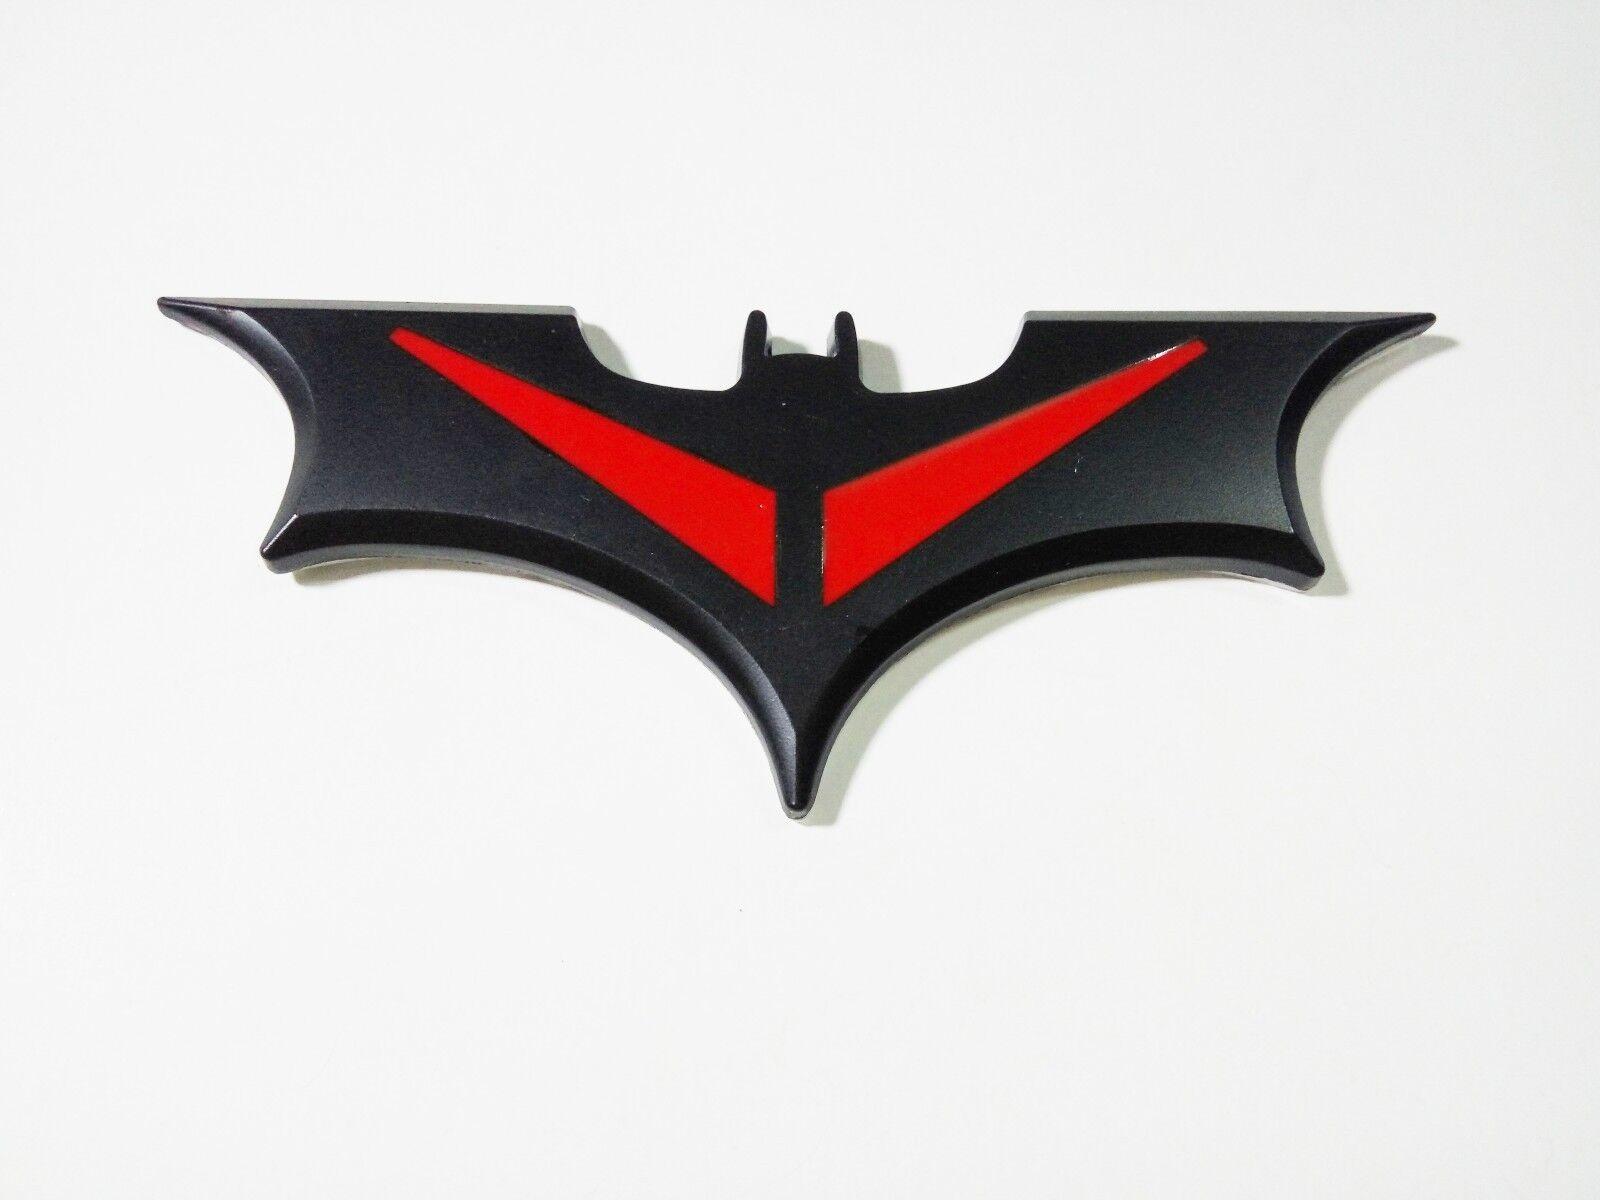 New Style 3D Metal Black Bat Auto Car Sticker Batman Badge Emblem Tail Decal